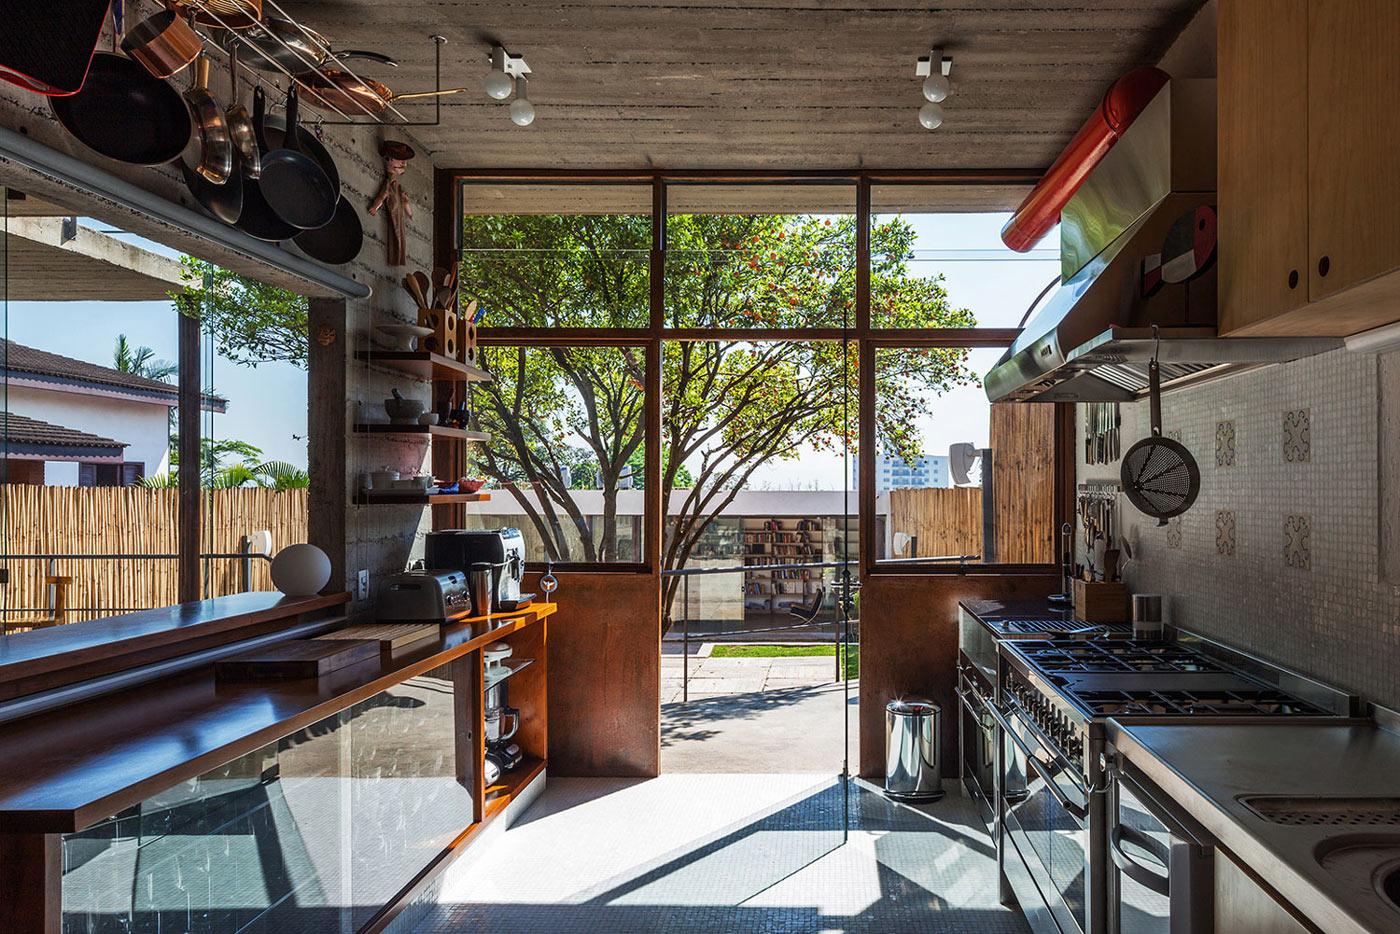 Kitchen, Urban House in São Paulo, Brazil